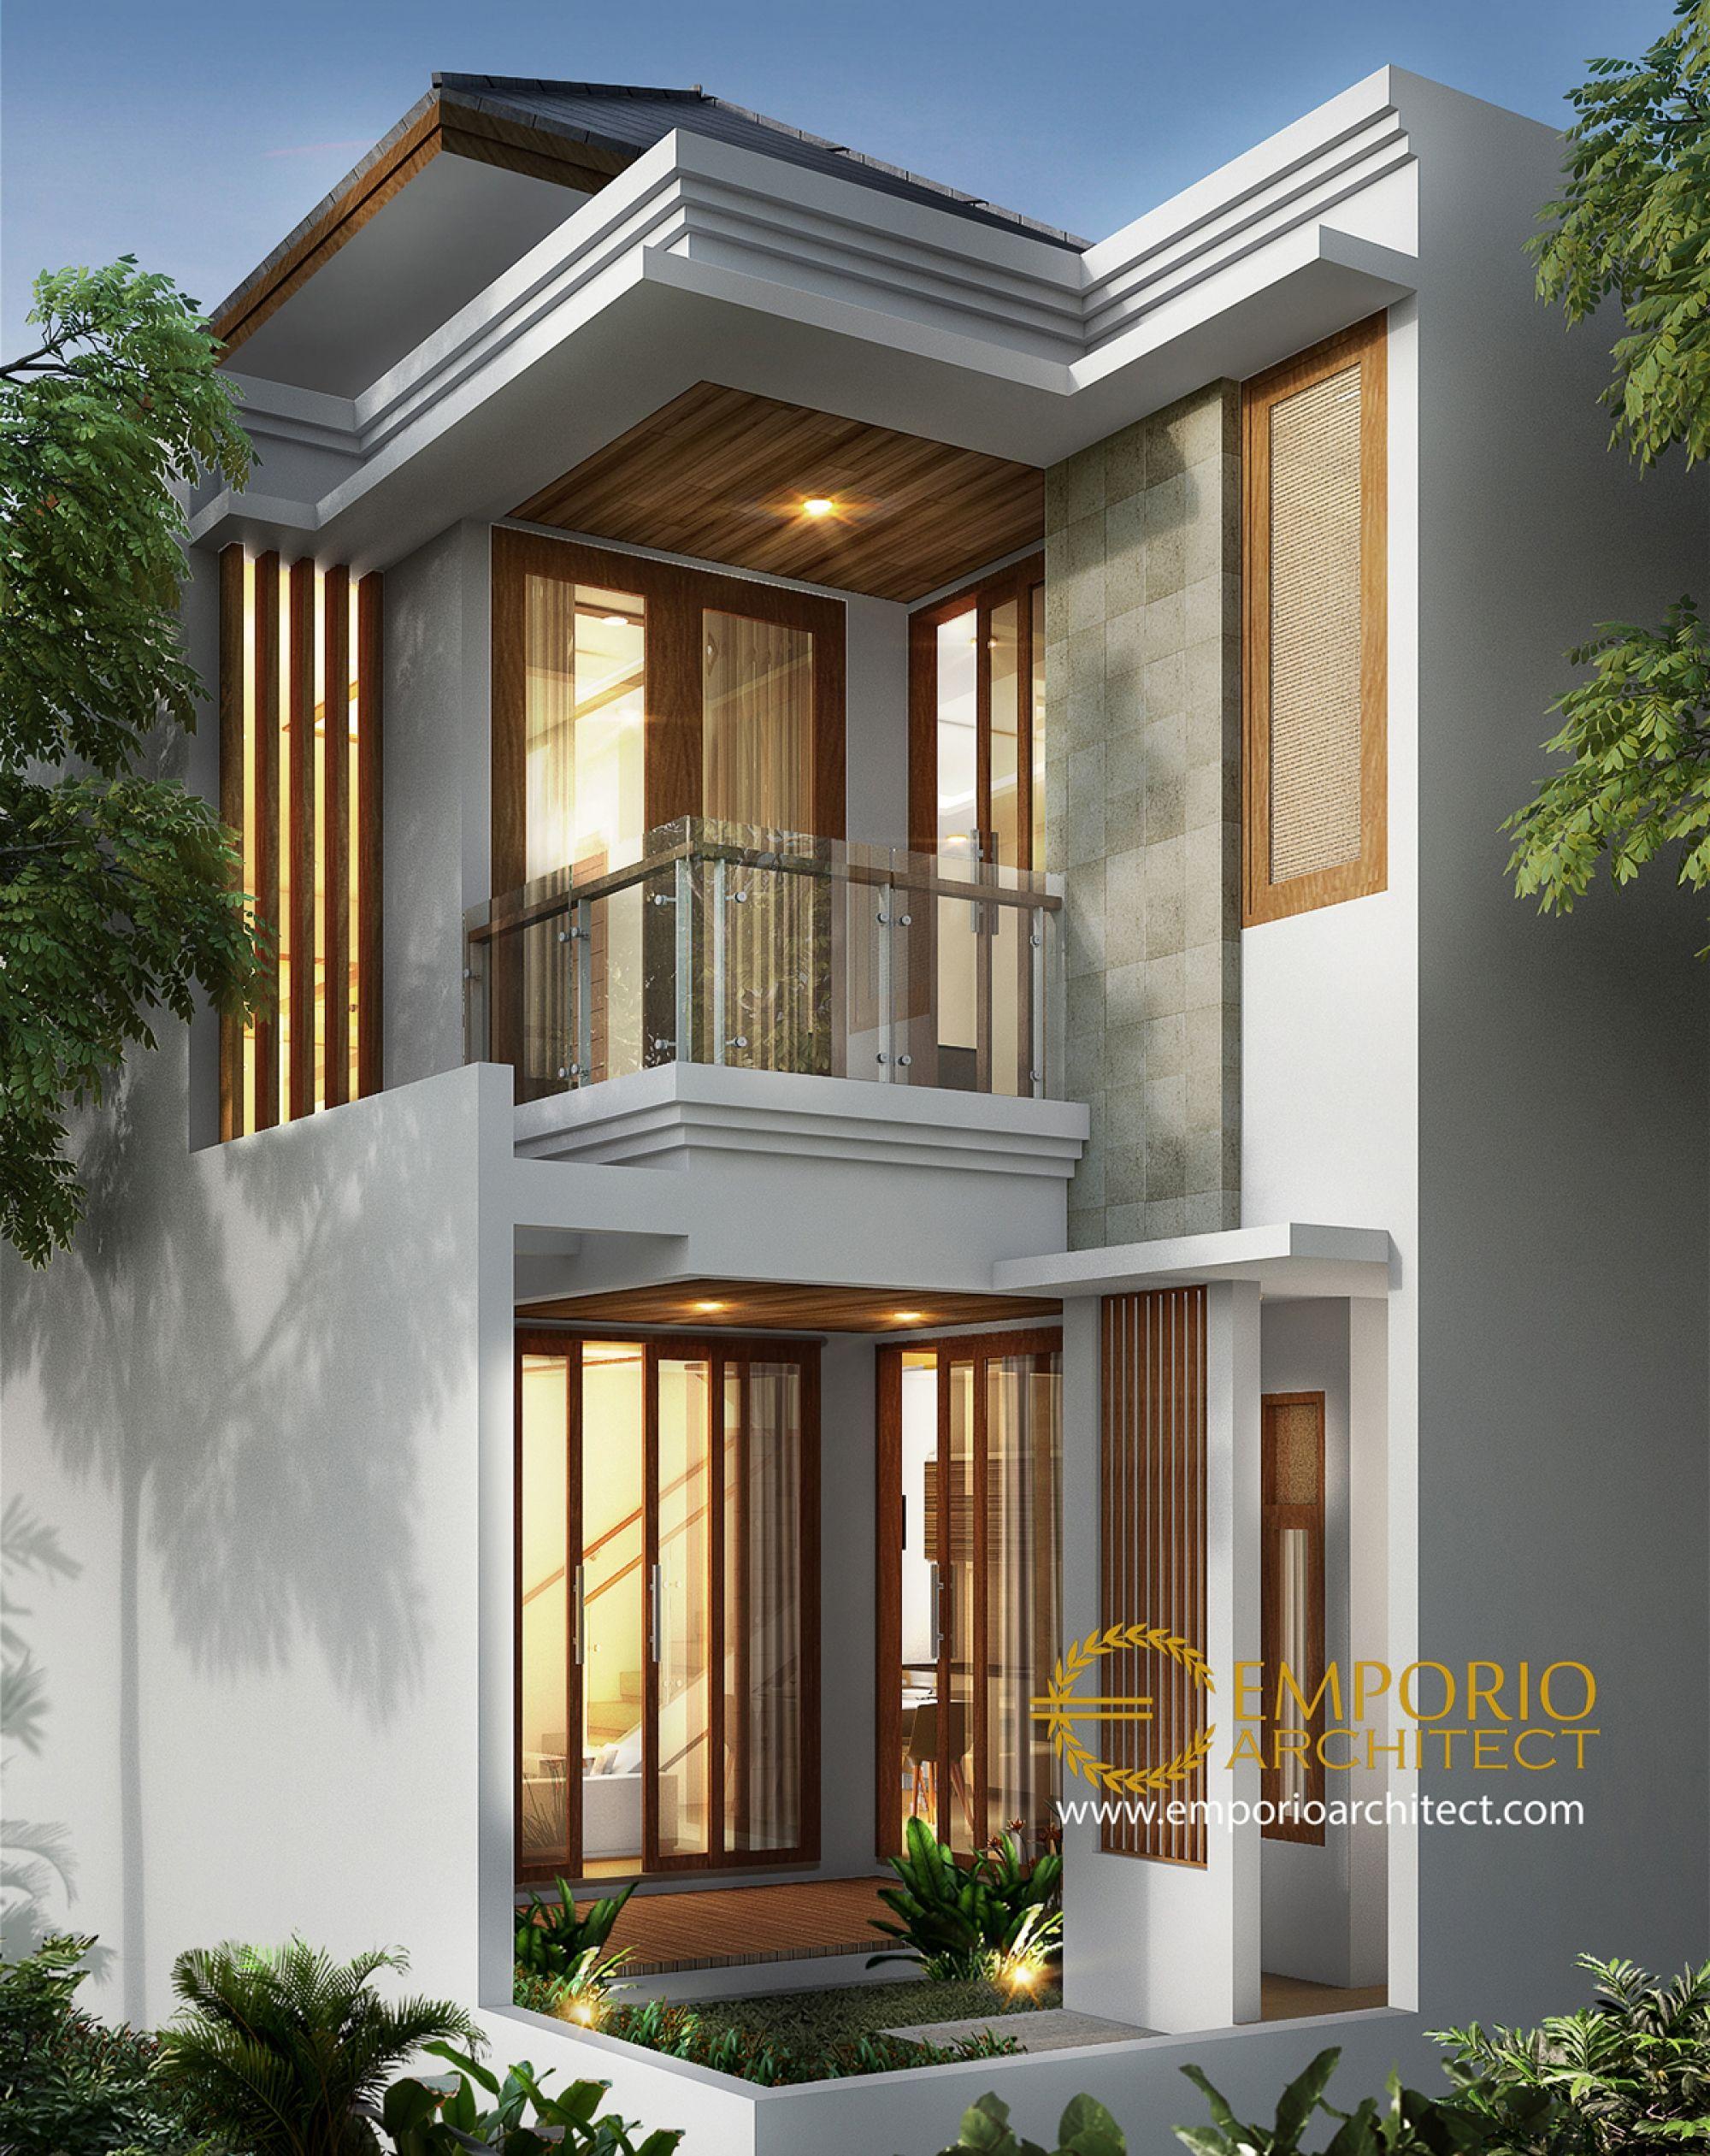 Jasa Arsitek Jakarta Desain Rumah Ibu Wulan Also Hind In House Designs  Exterior Pinterest Rh